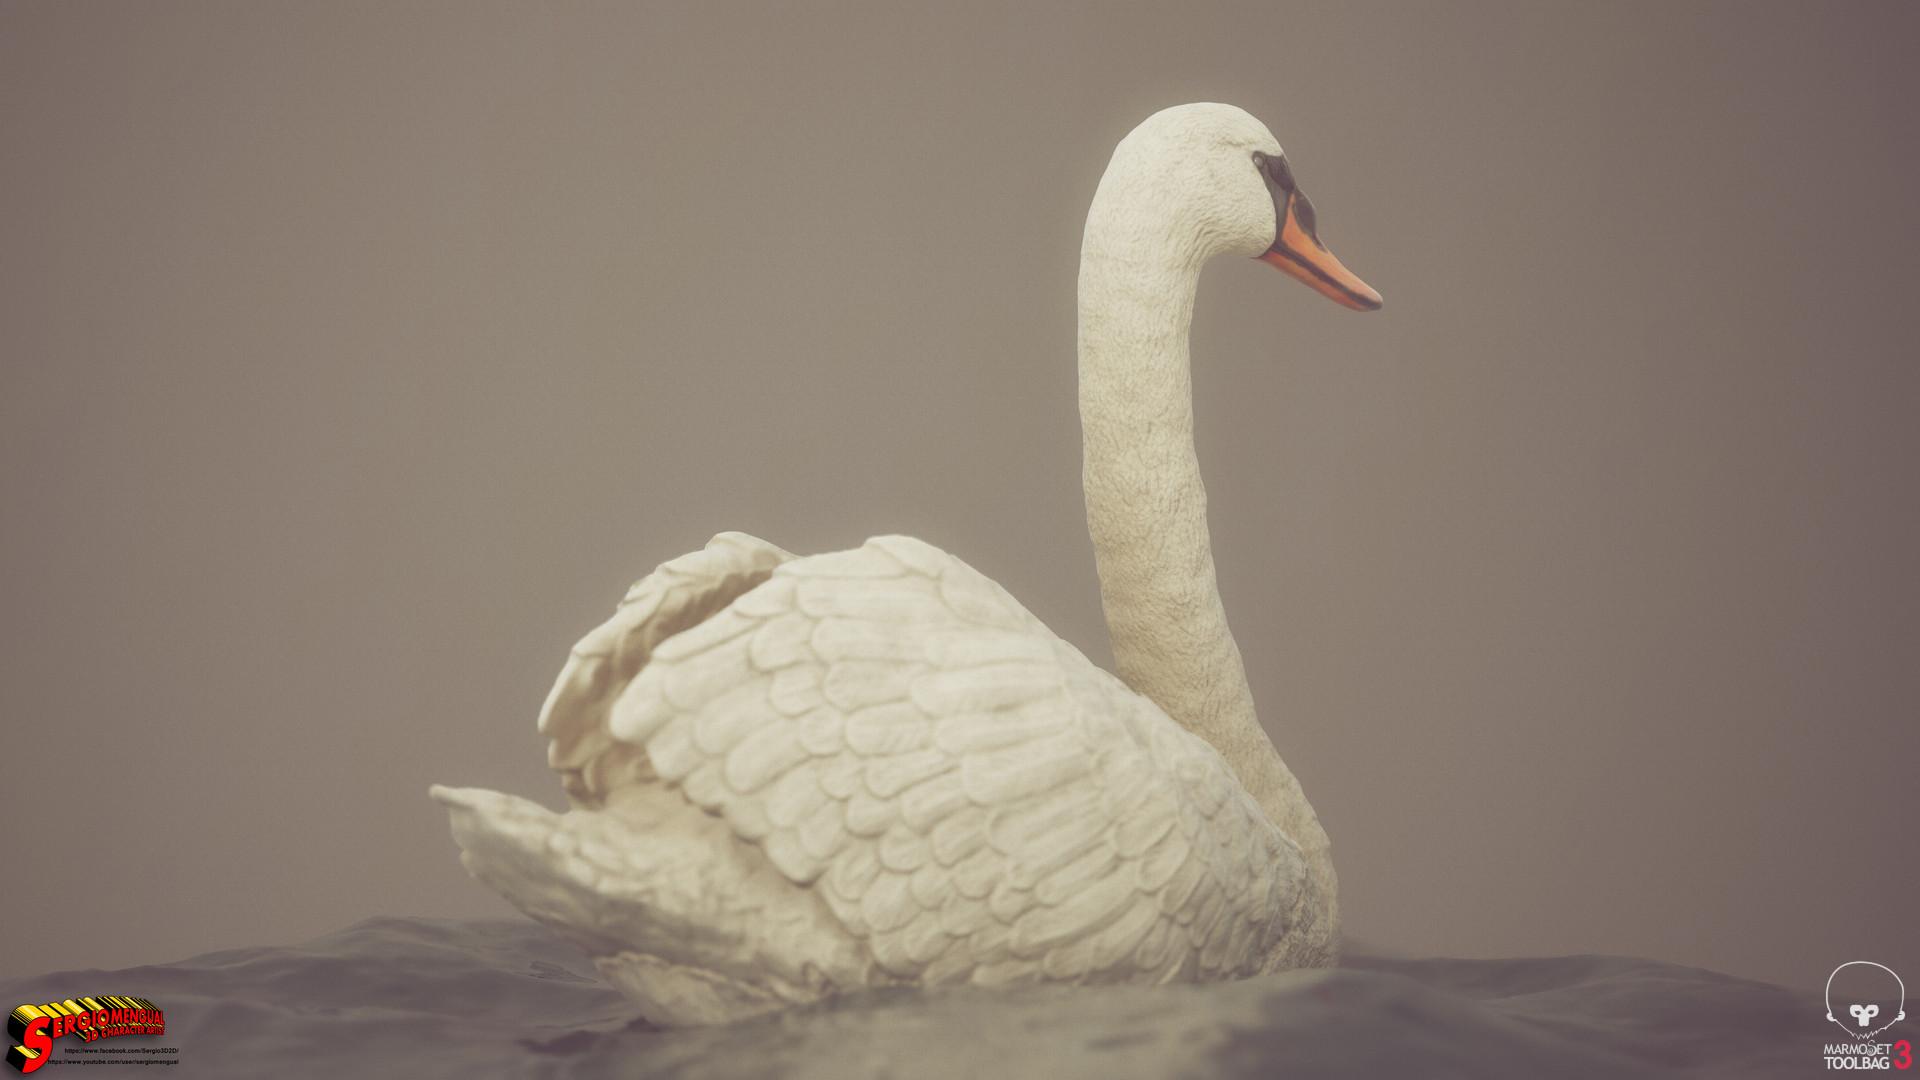 Sergio gabriel mengual swan horizontal 2